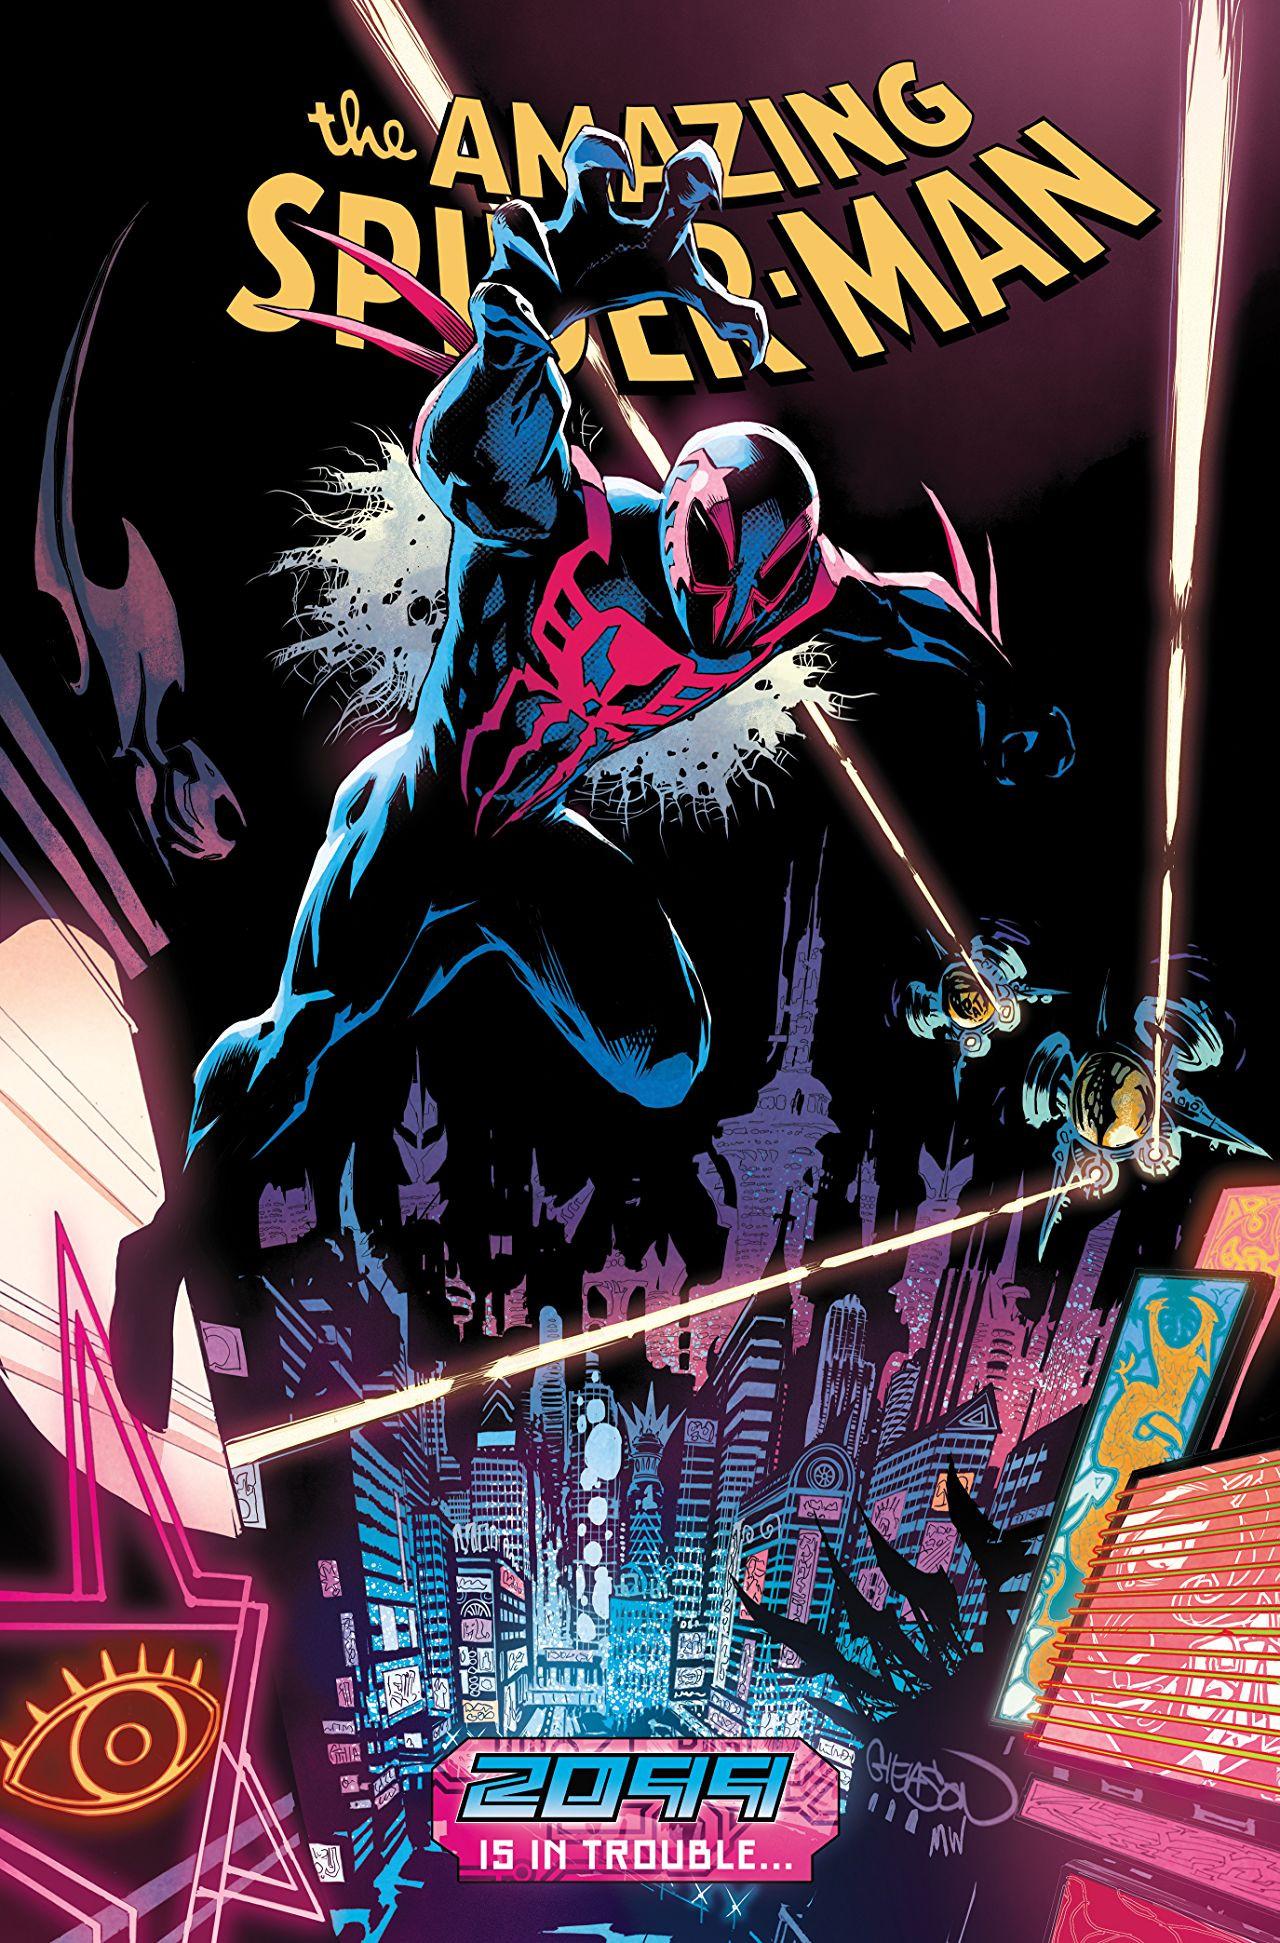 Amazing Spider-Man by Nick Spencer Vol 1 7: 2099